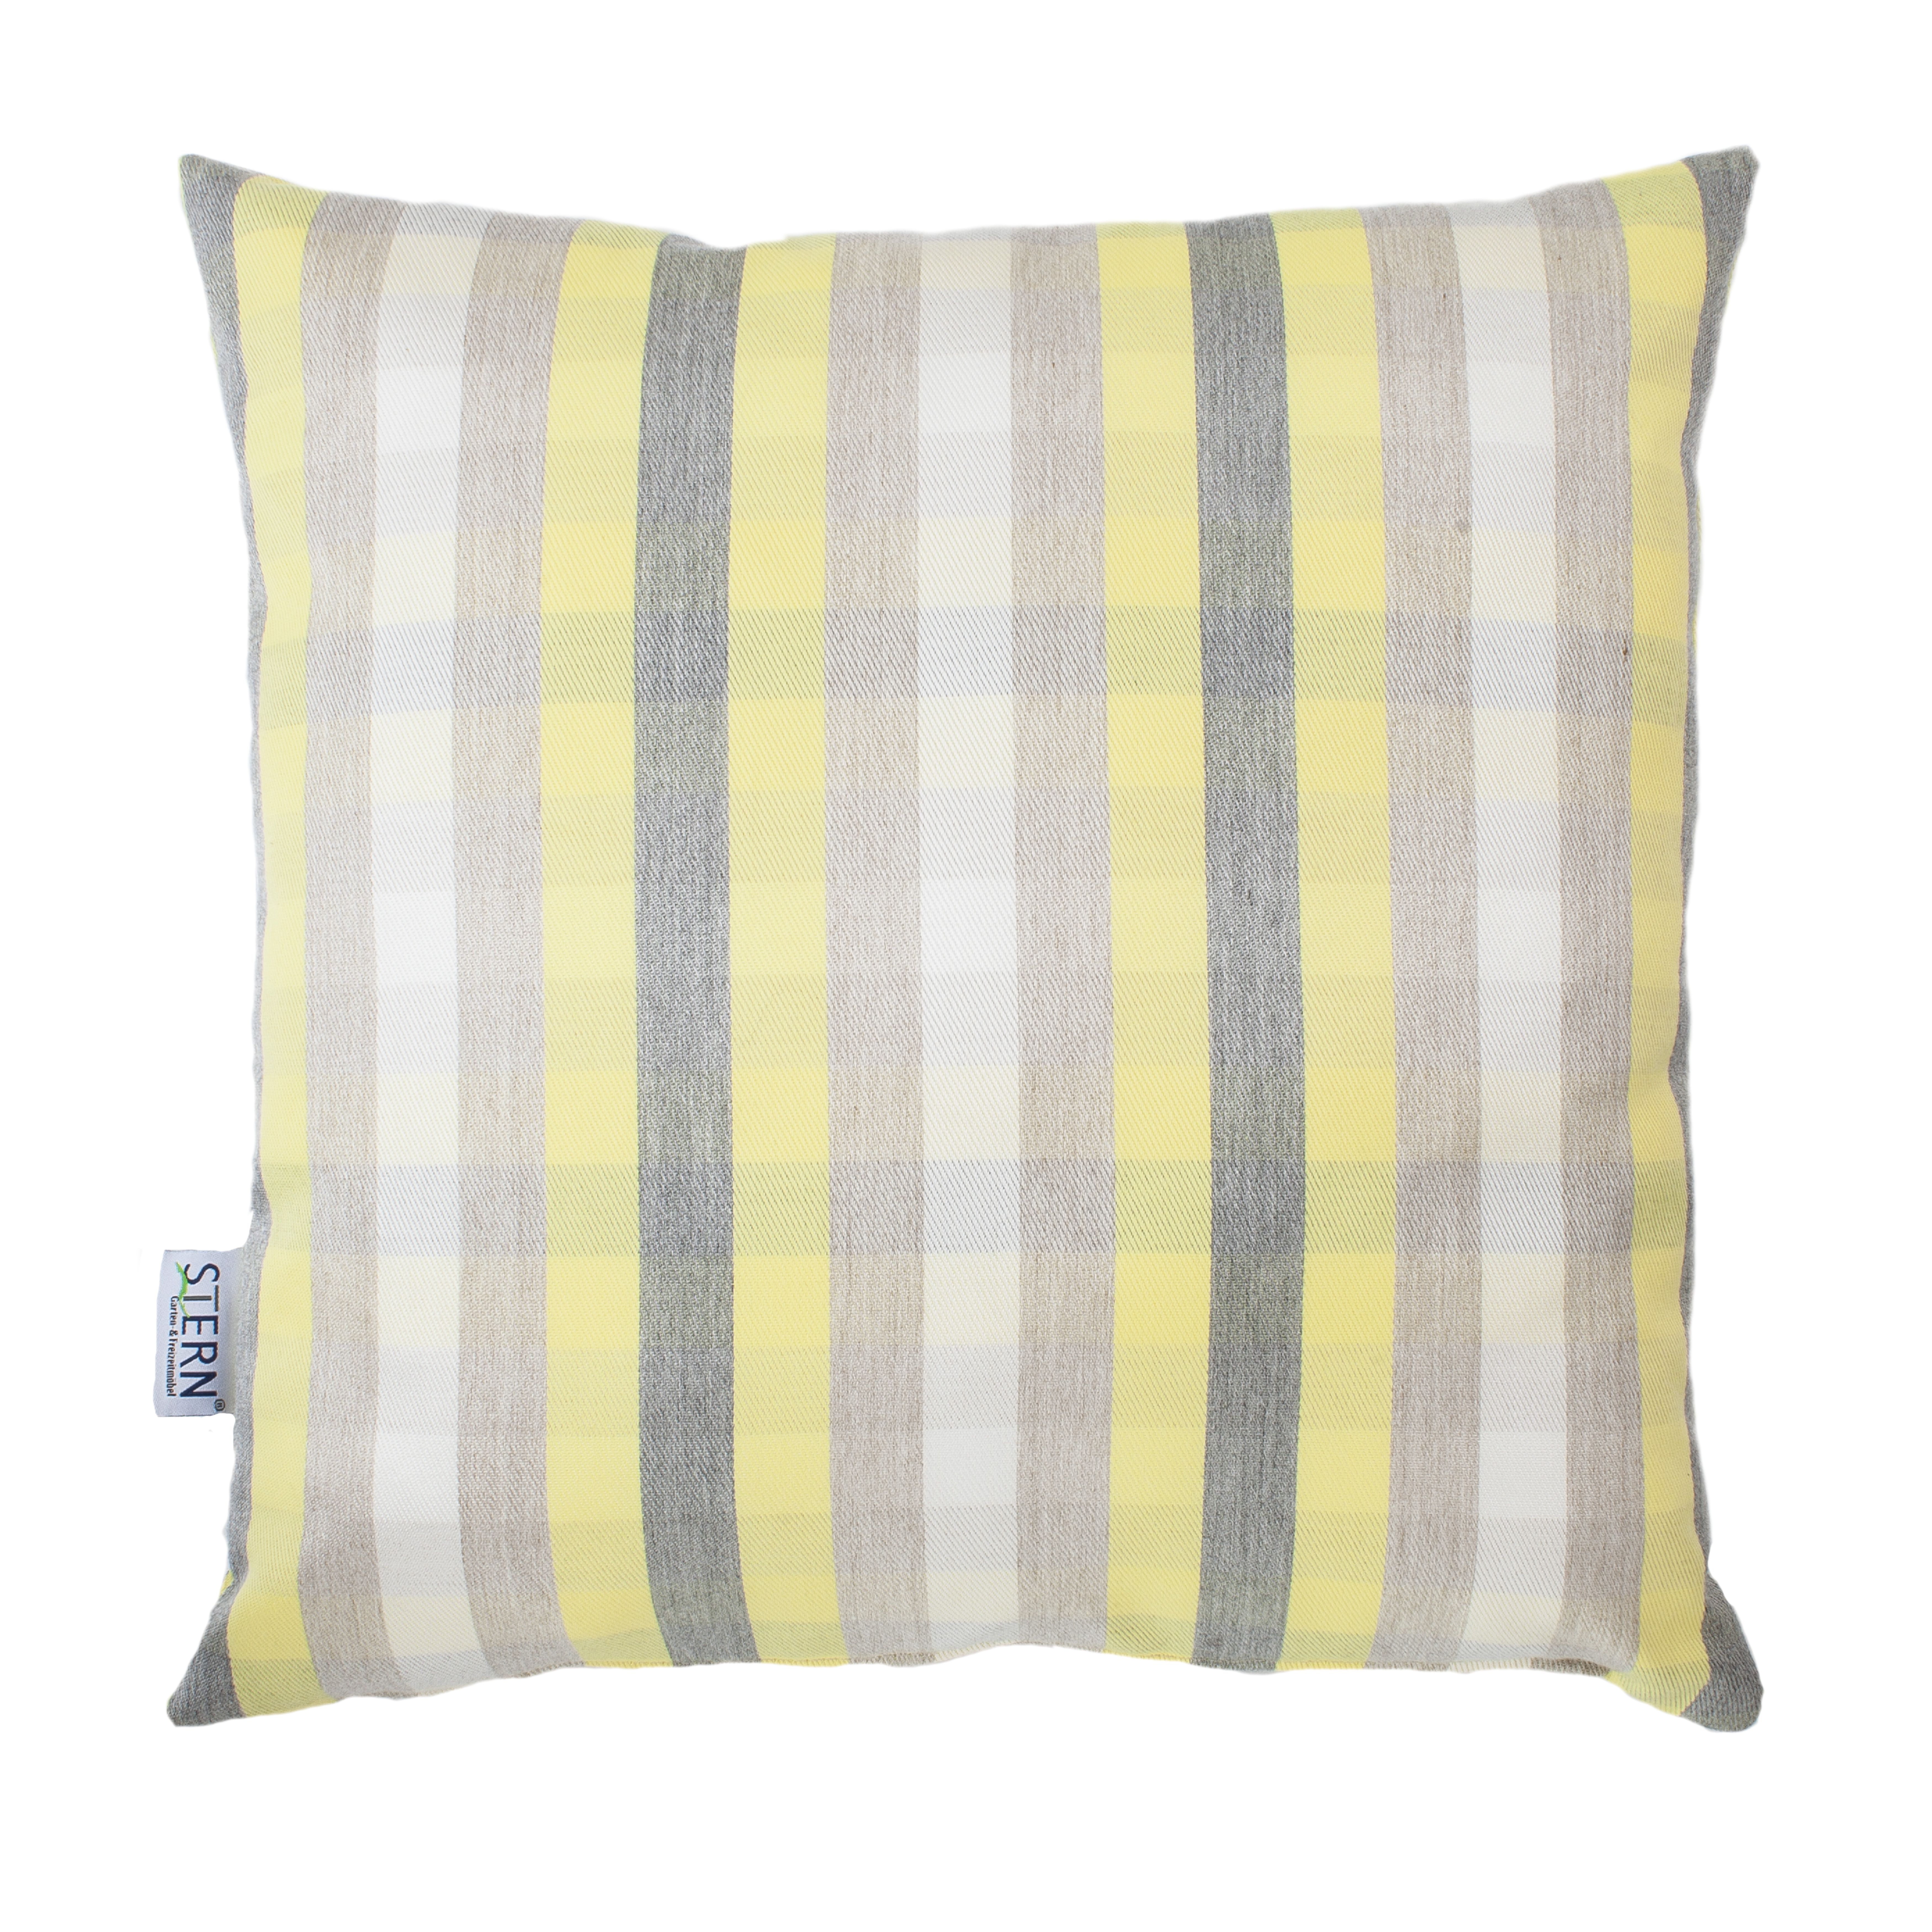 zubeh r gartenm bel onlineshop nentwich gartenbau baumschule floristik. Black Bedroom Furniture Sets. Home Design Ideas